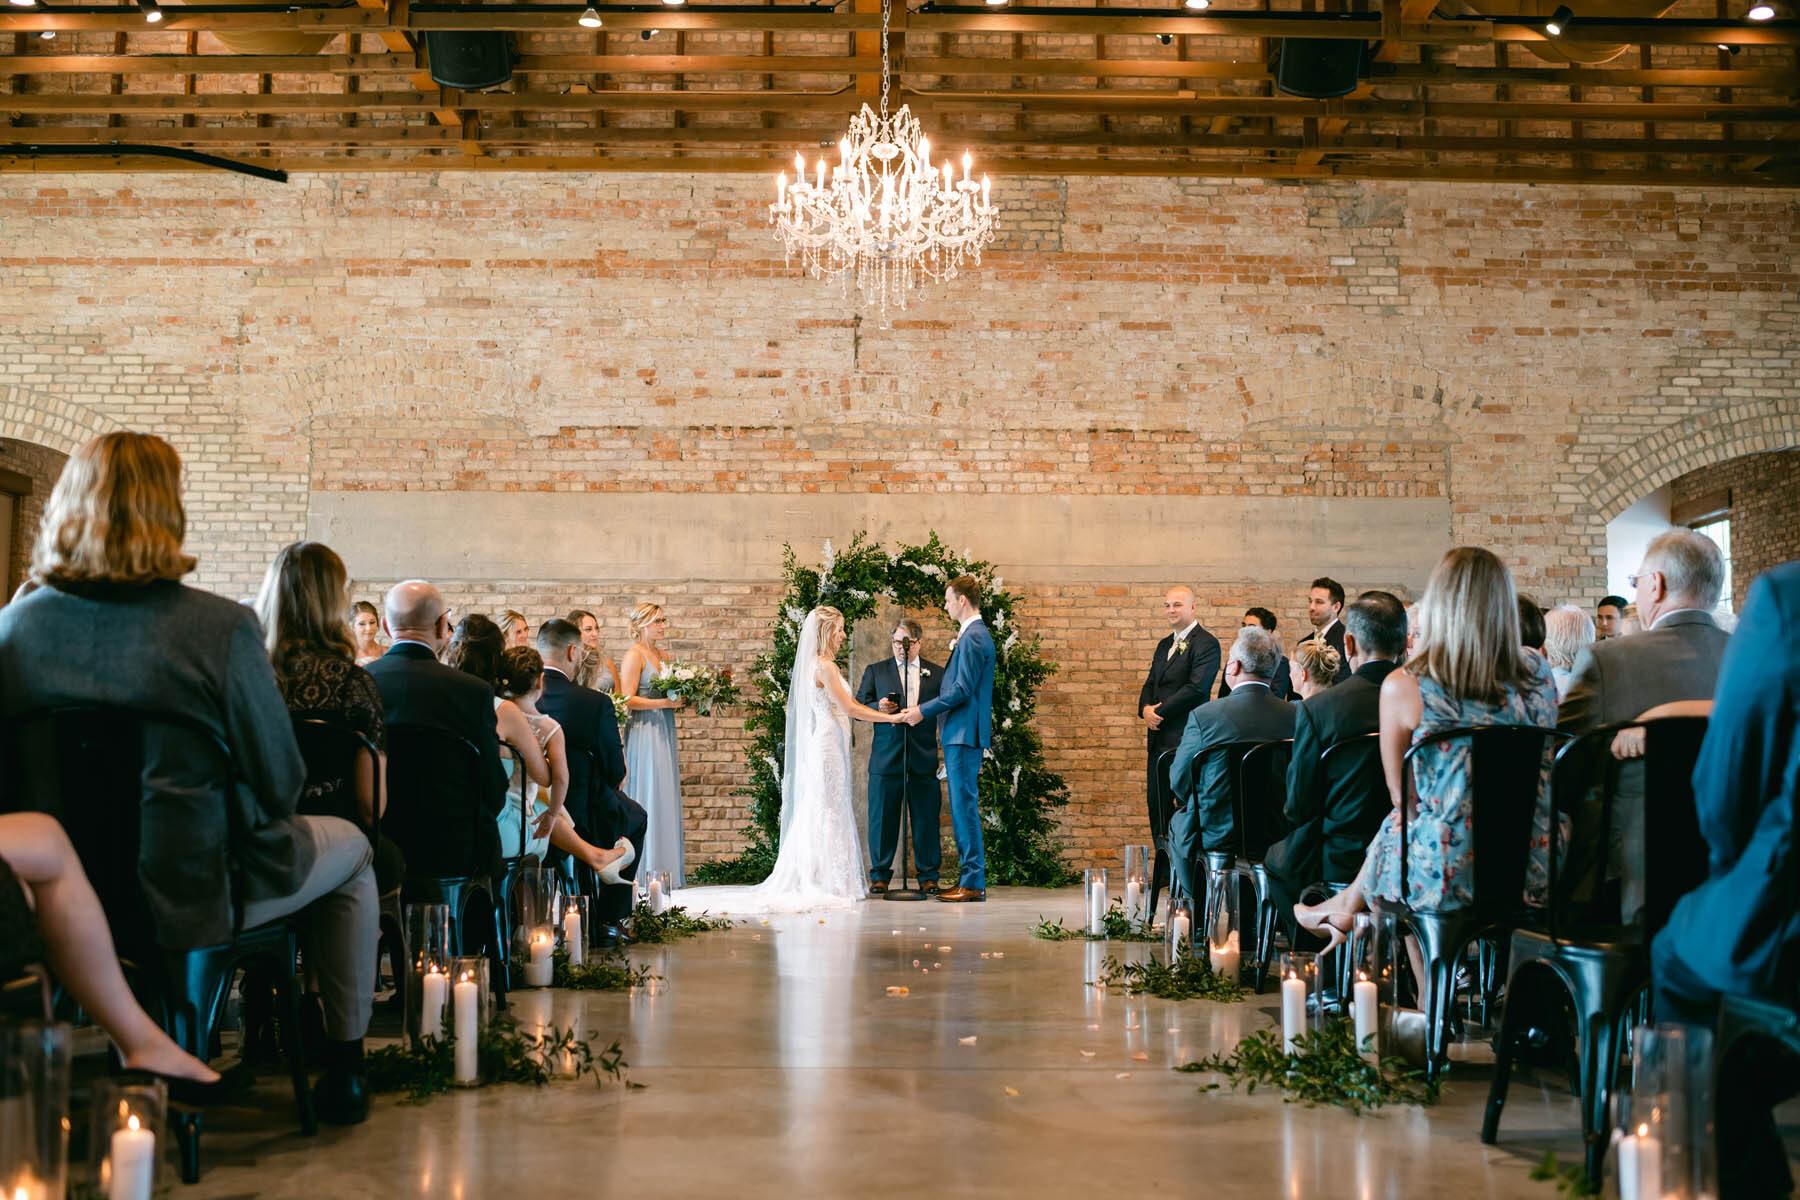 The Brix wedding